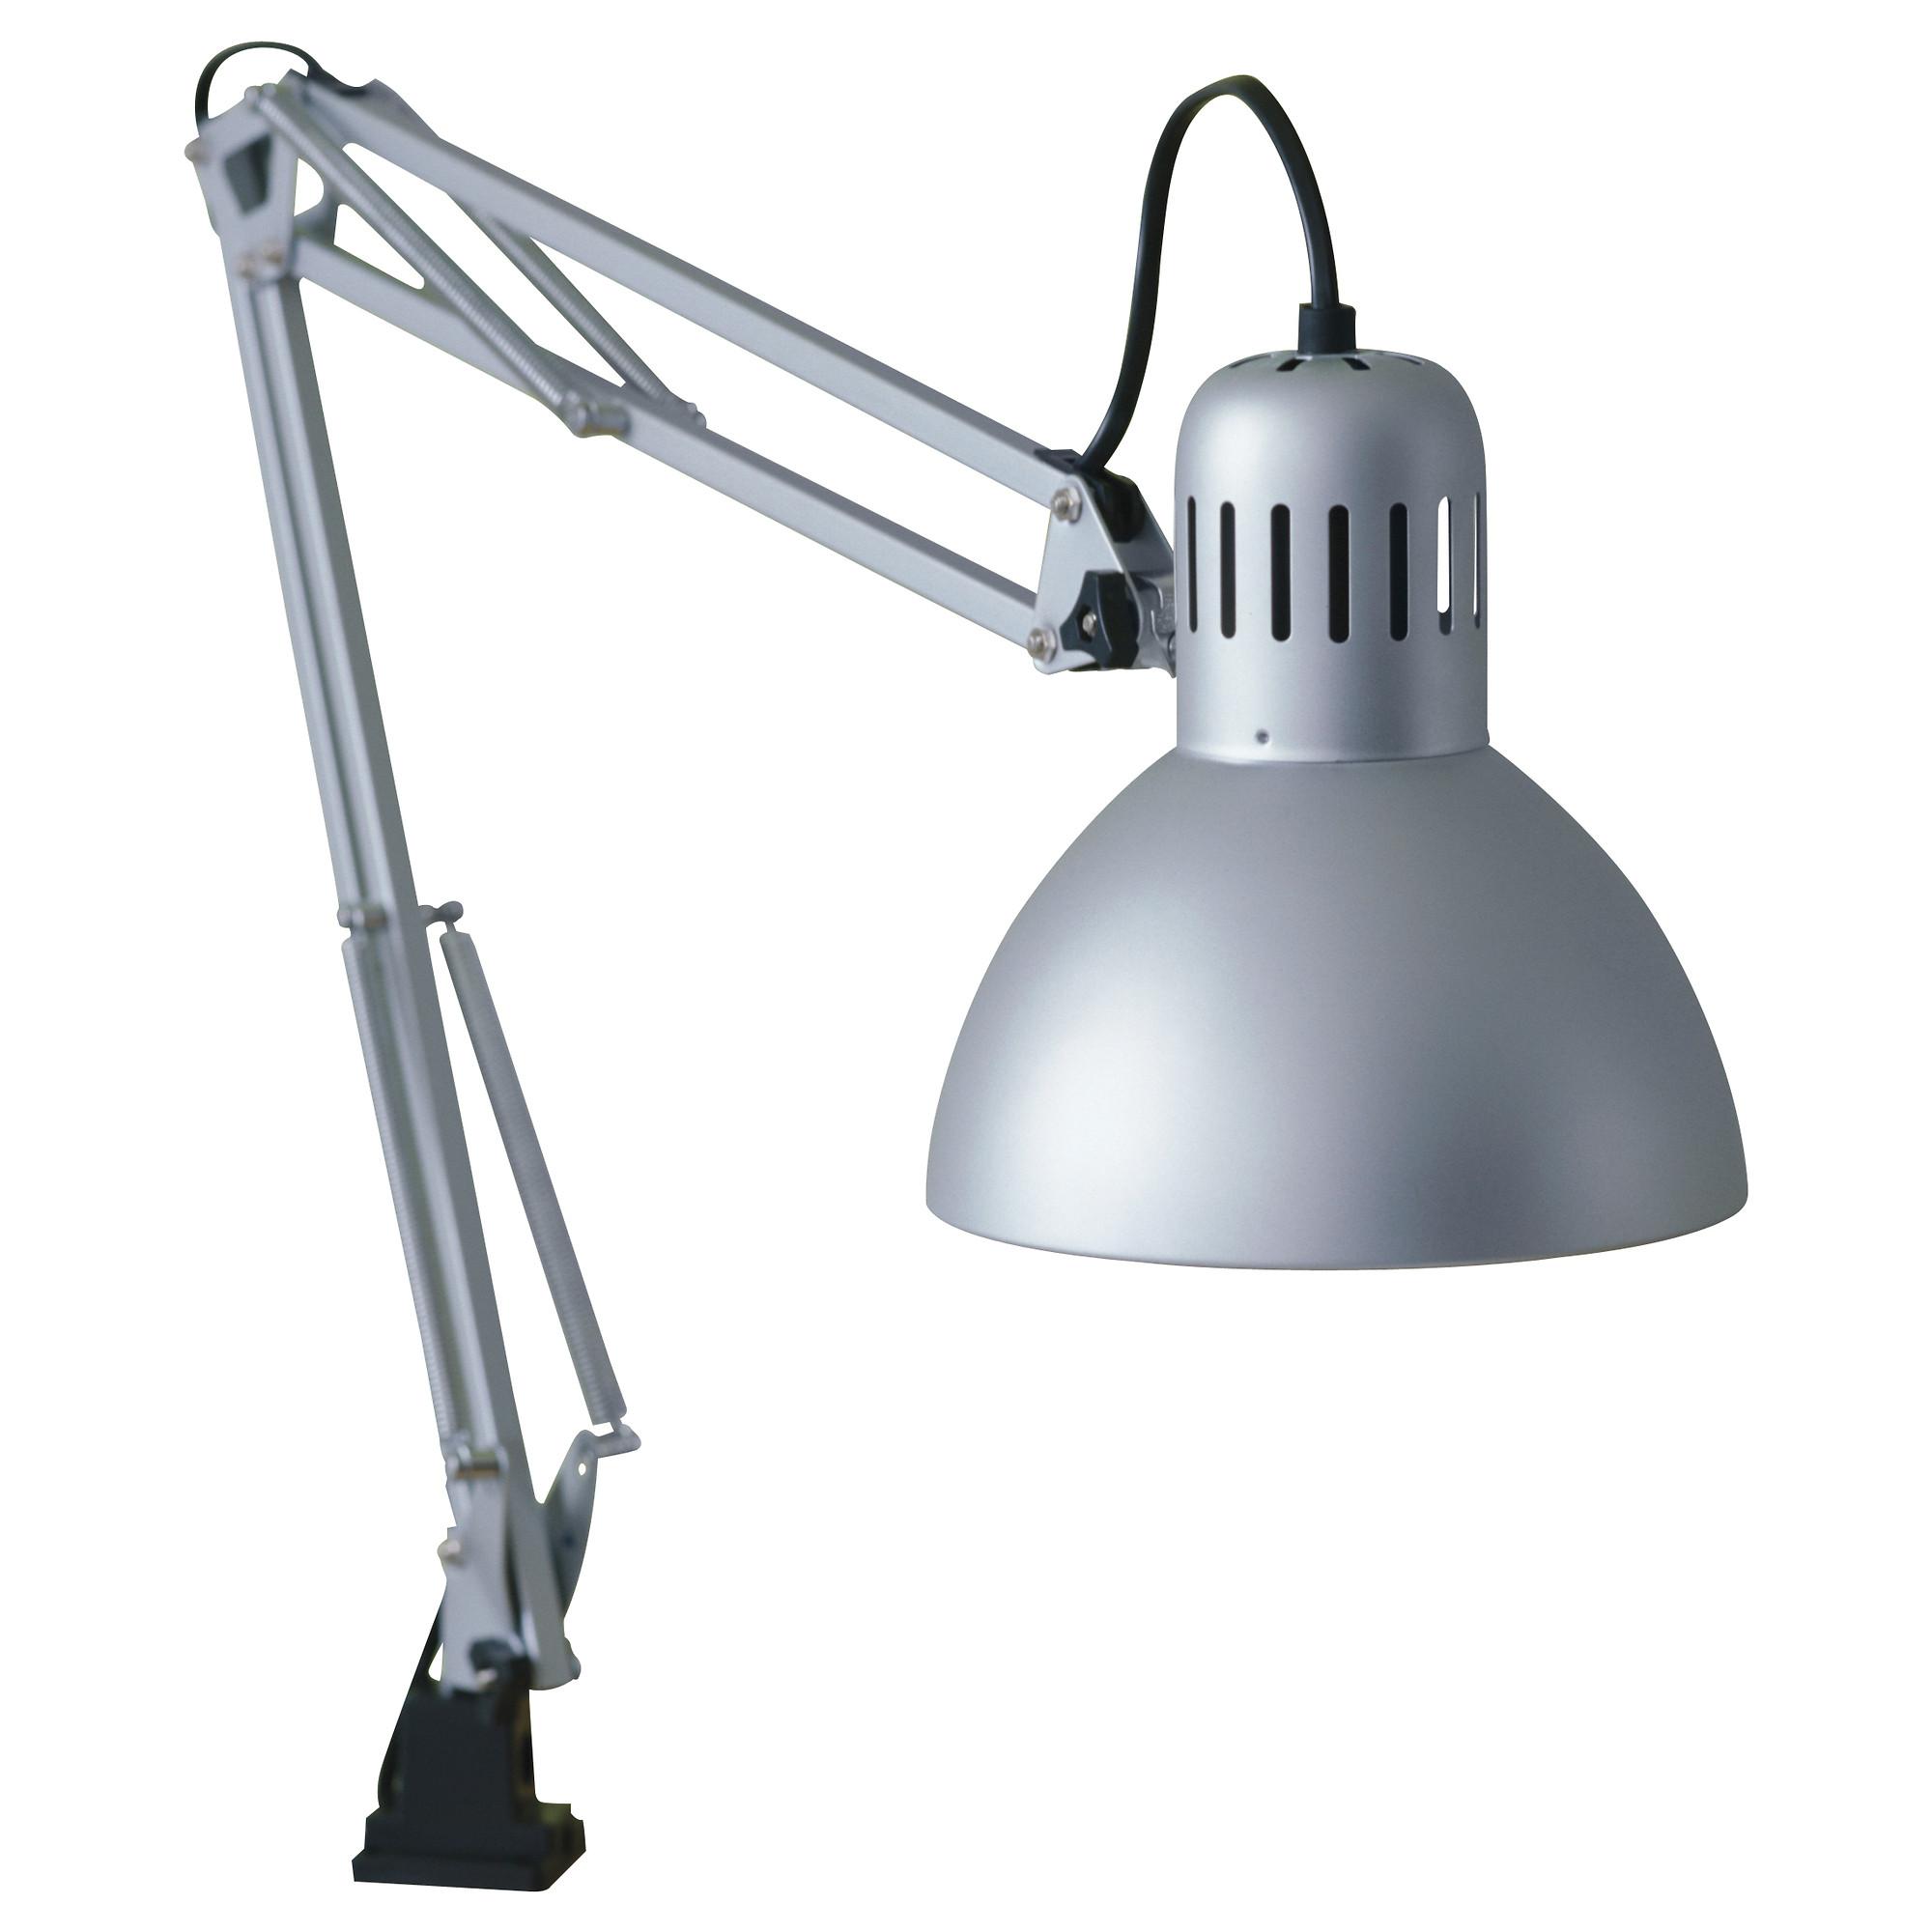 Wall Mounted Desk Lamp Photo 2